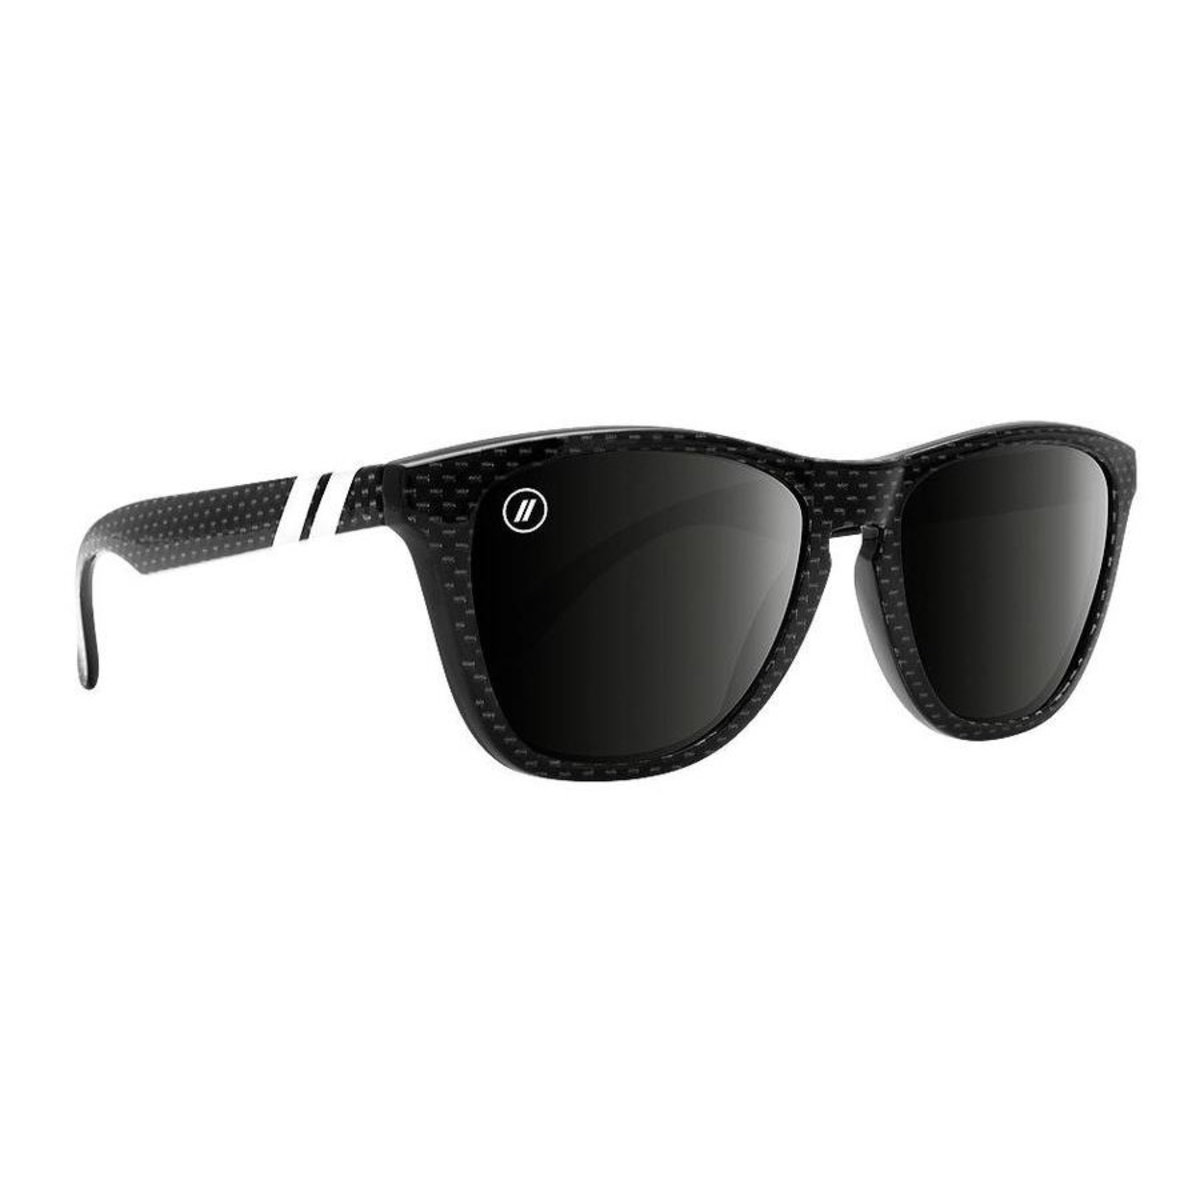 L Series // 偏光鏡片黑色花紋梯形鏡框太陽眼鏡